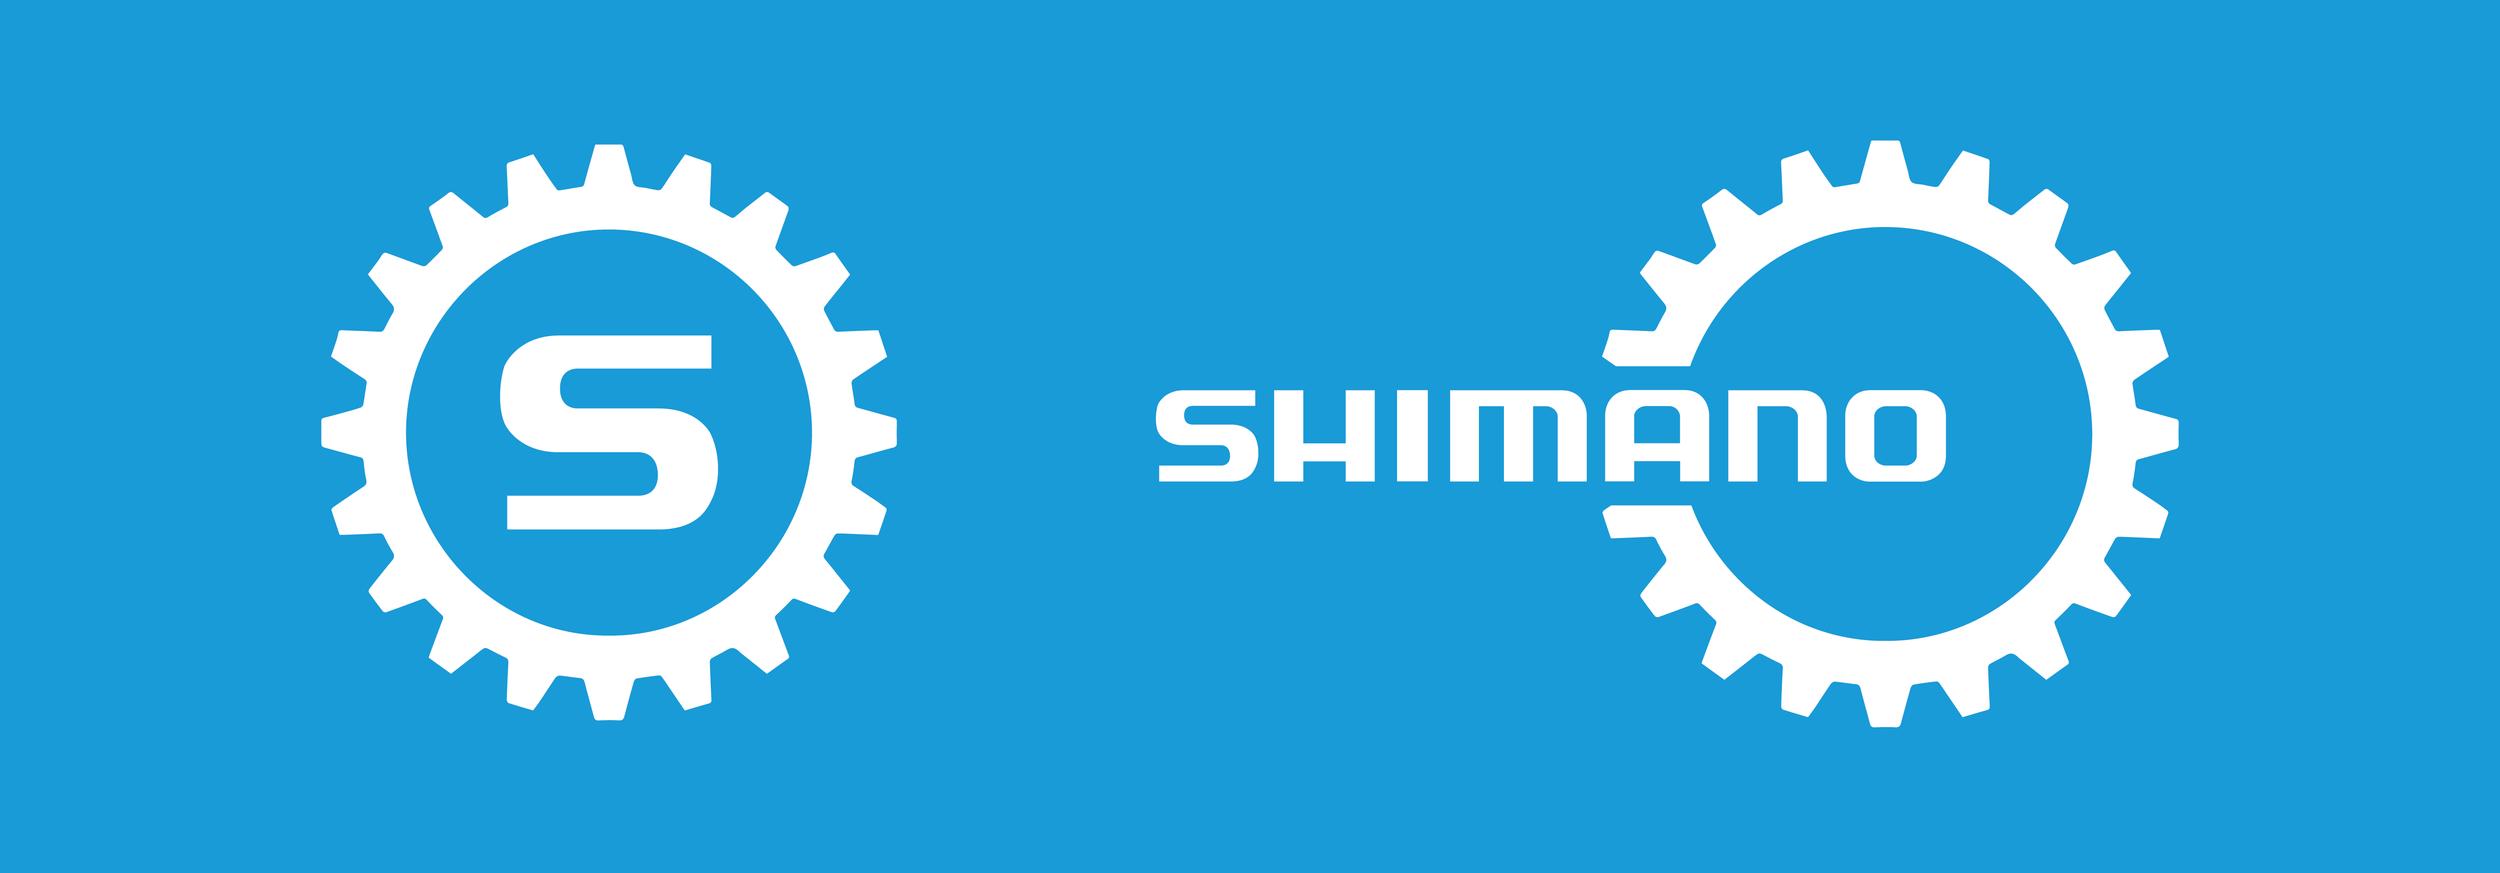 Final Logo Redesign